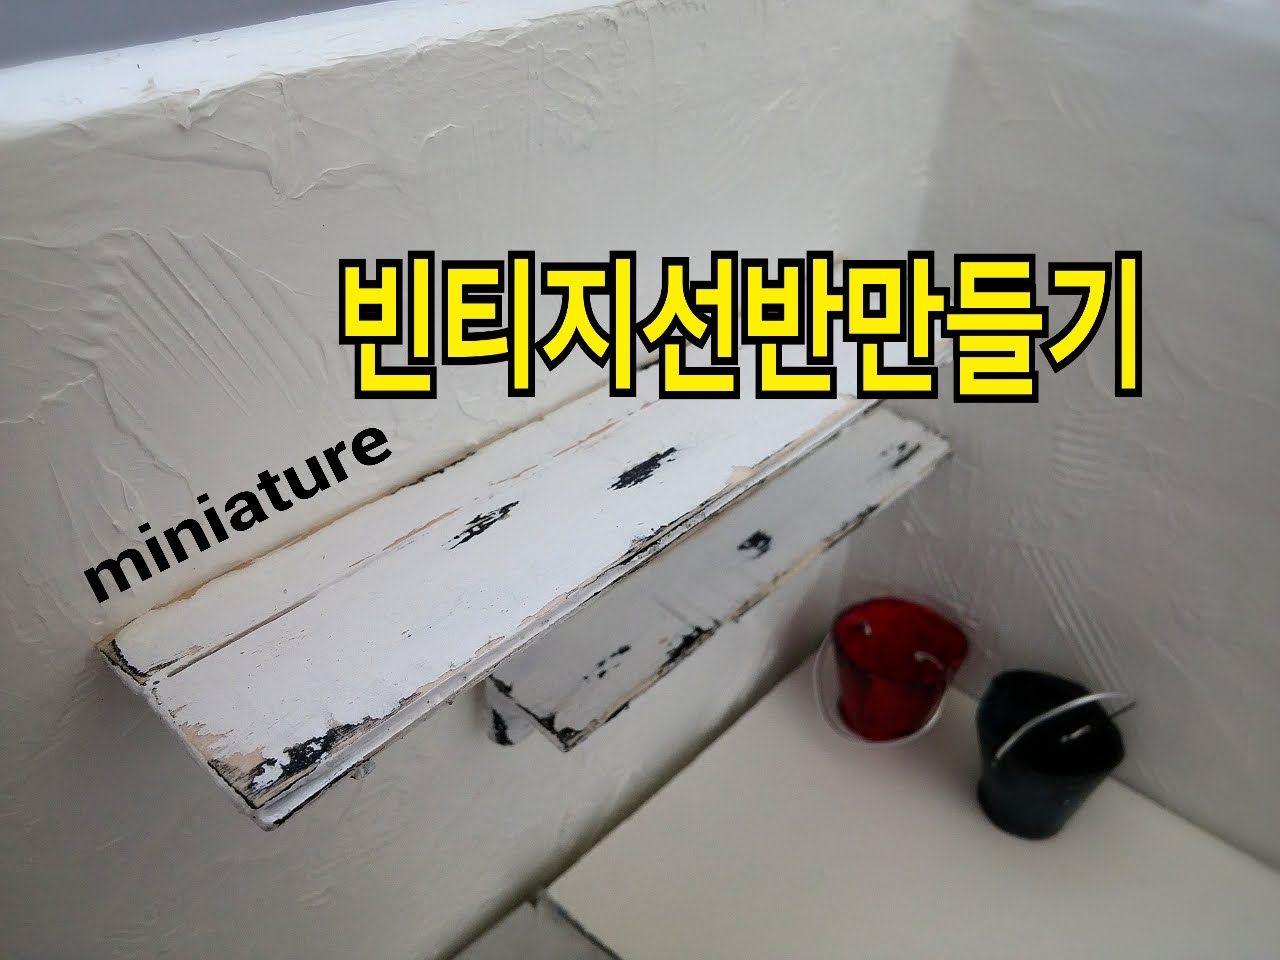 [miniature]미니어쳐 빈티지선반만들기 Vintage shelf